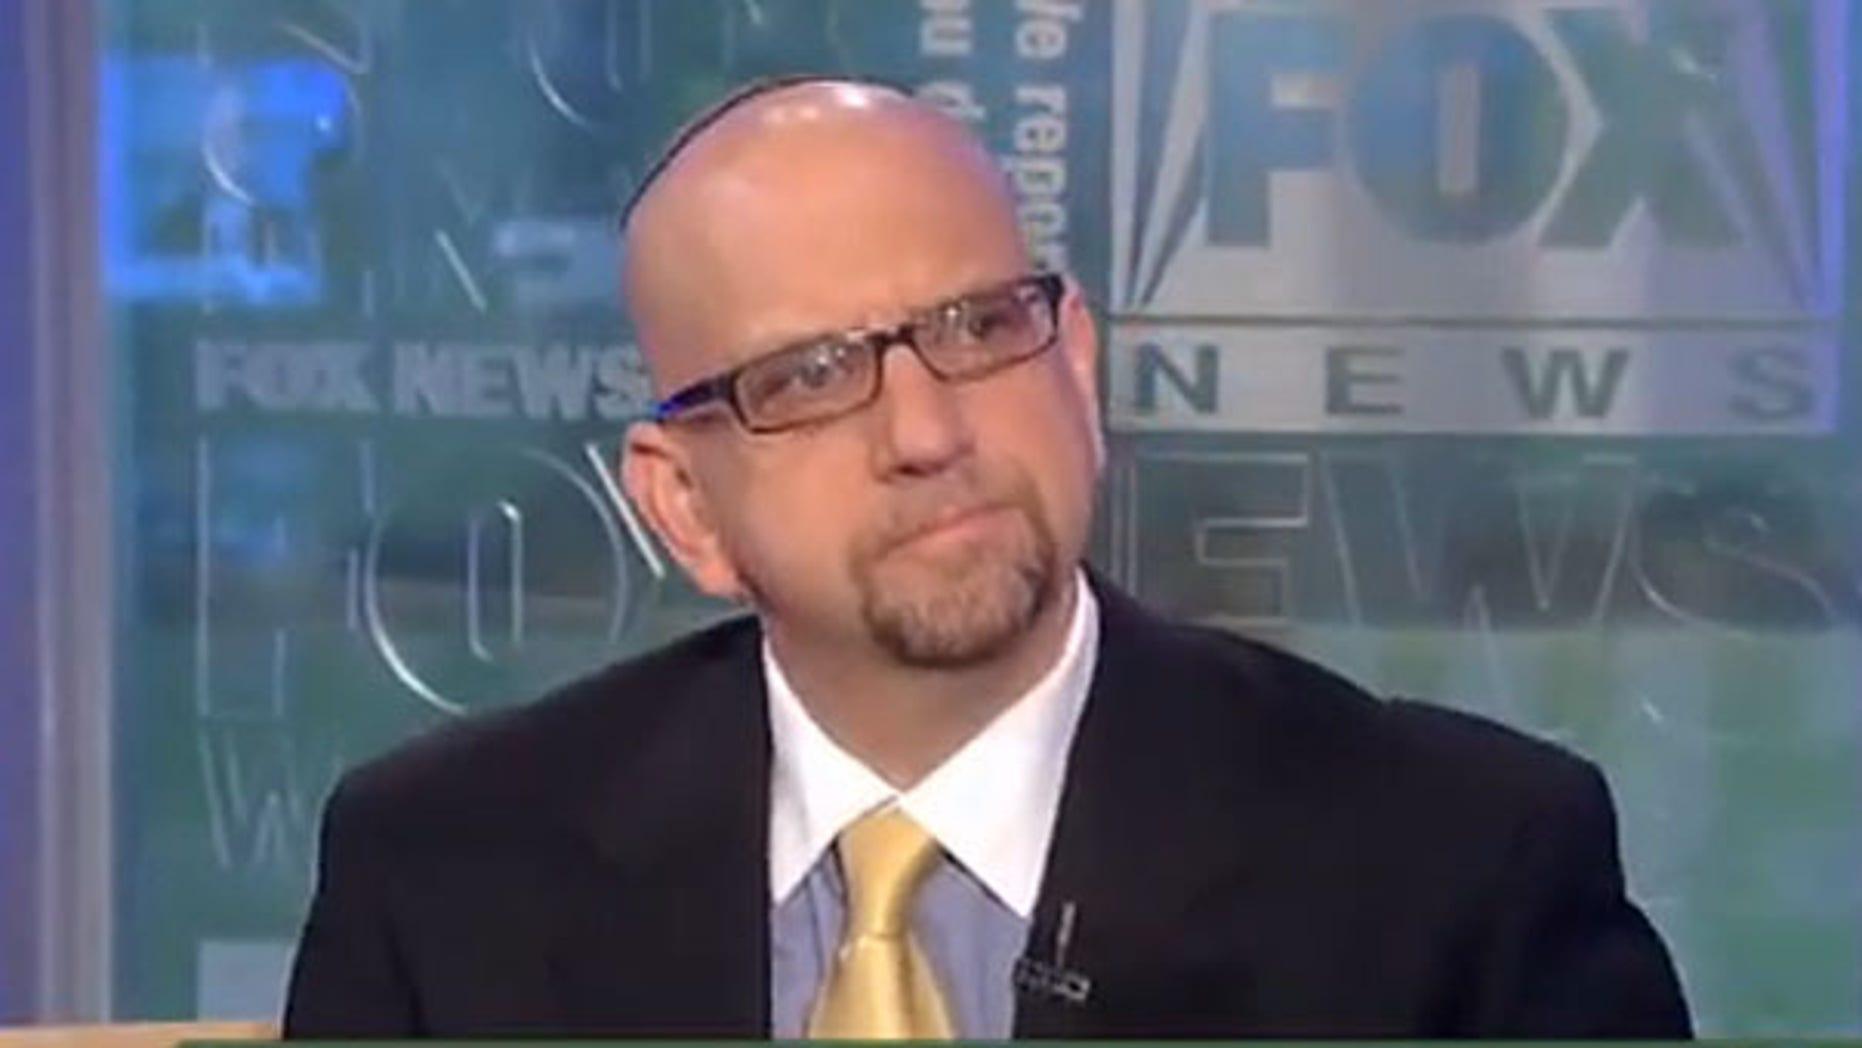 Shown here is Rabbi David Nesenoff, who shot video of Helen Thomas criticizing Israel in May. (FNC)